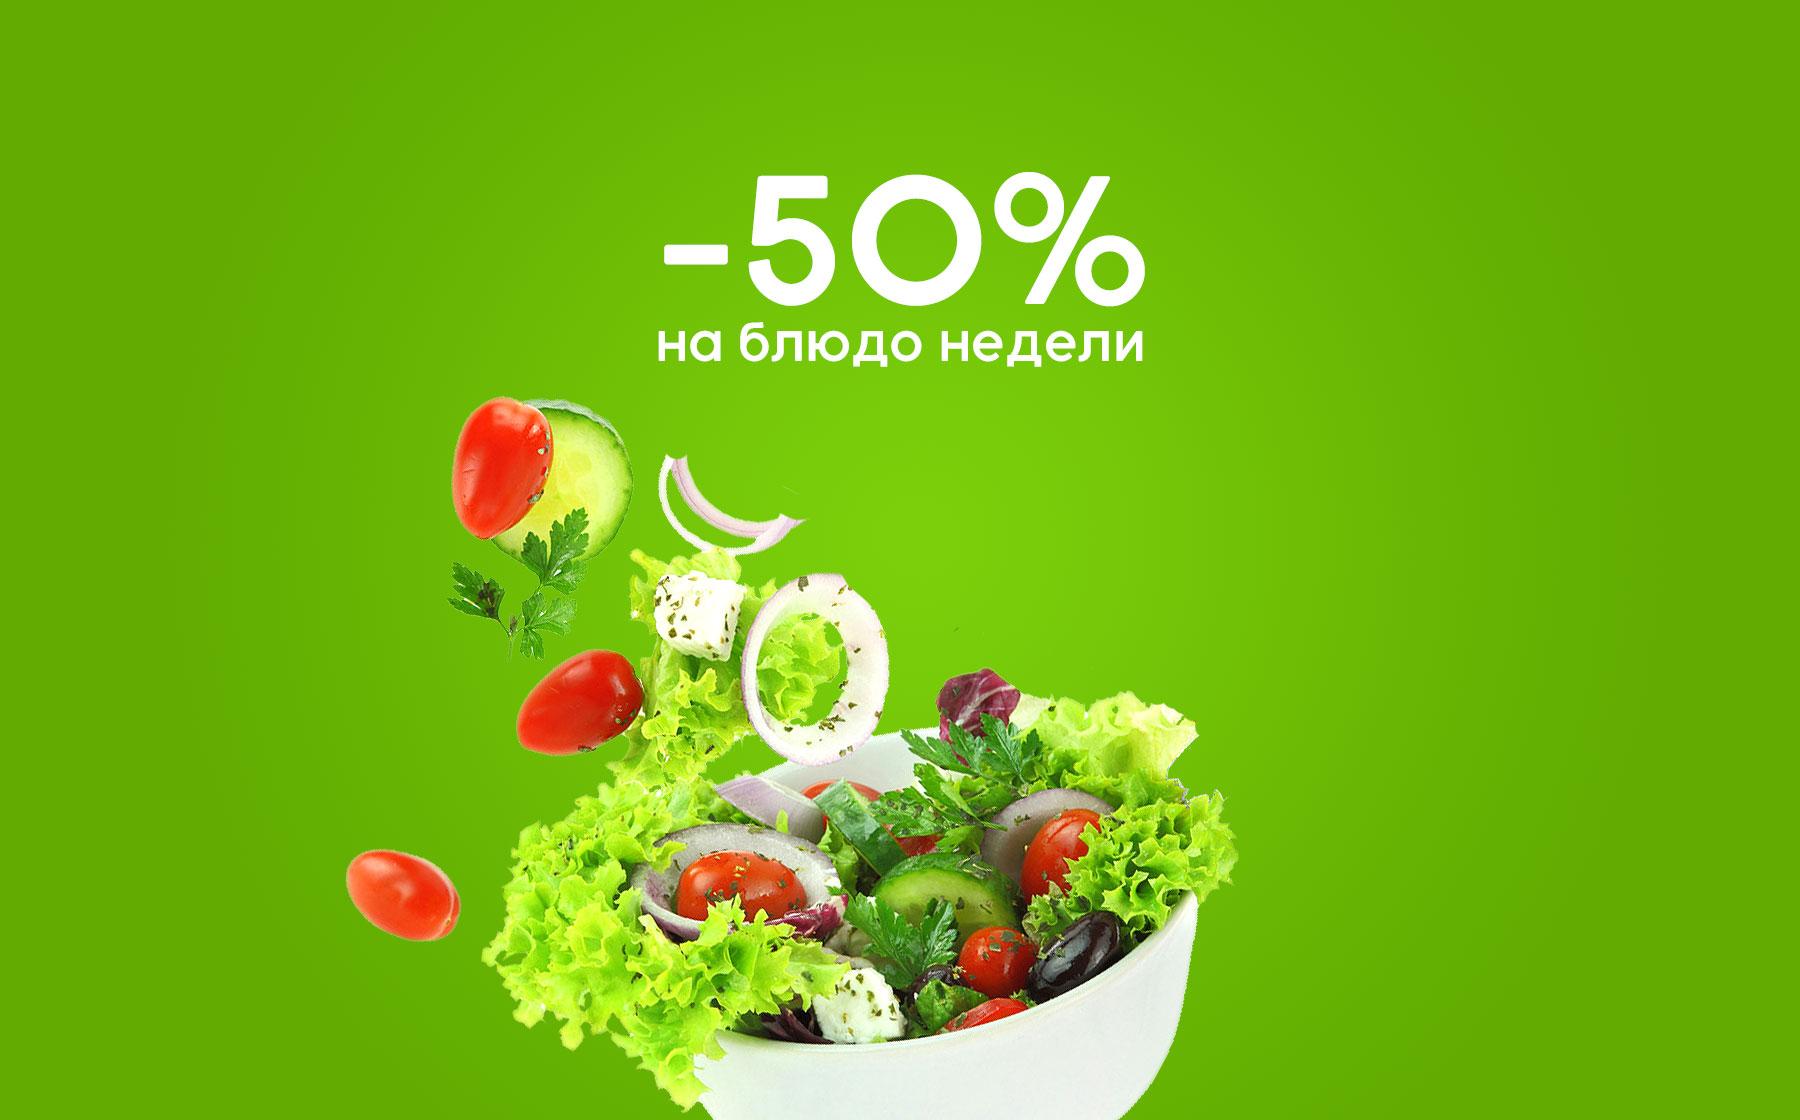 -50% Скидка на блюдо недели